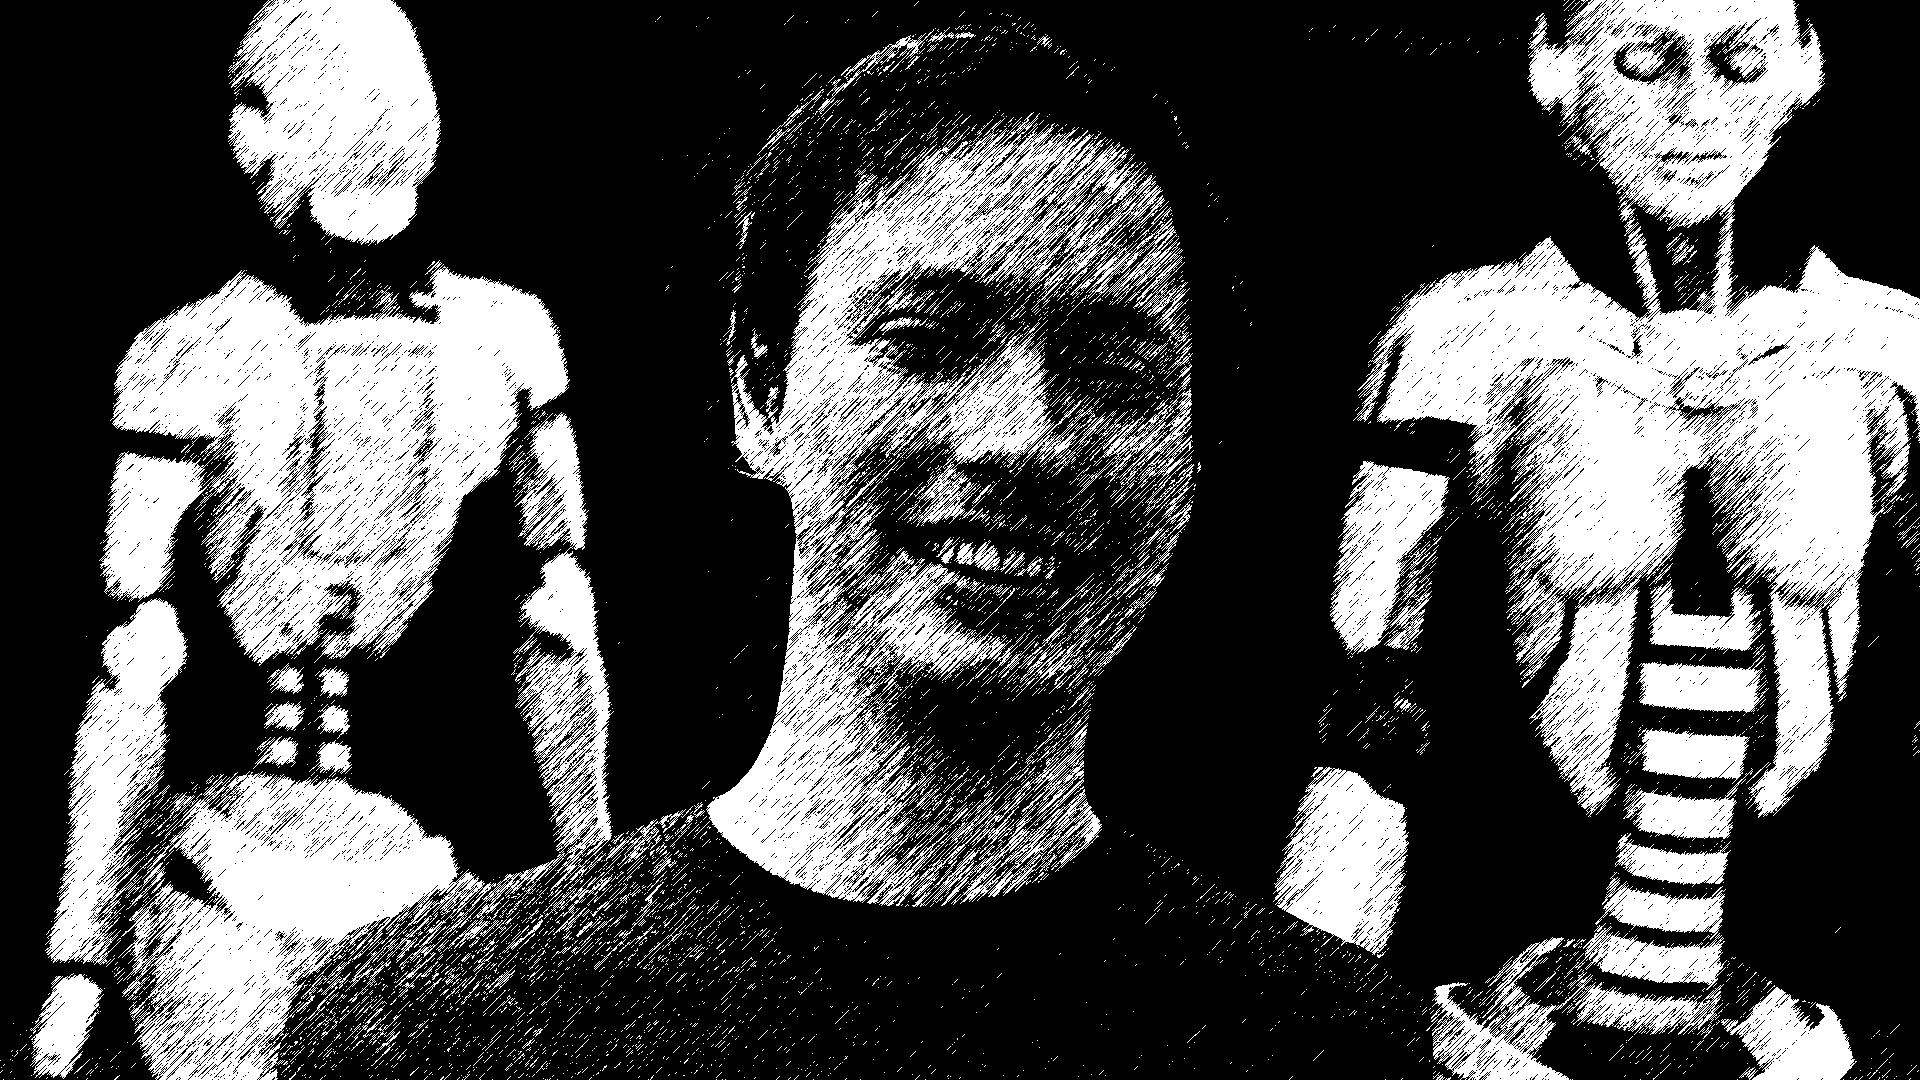 Matúš-Instyle